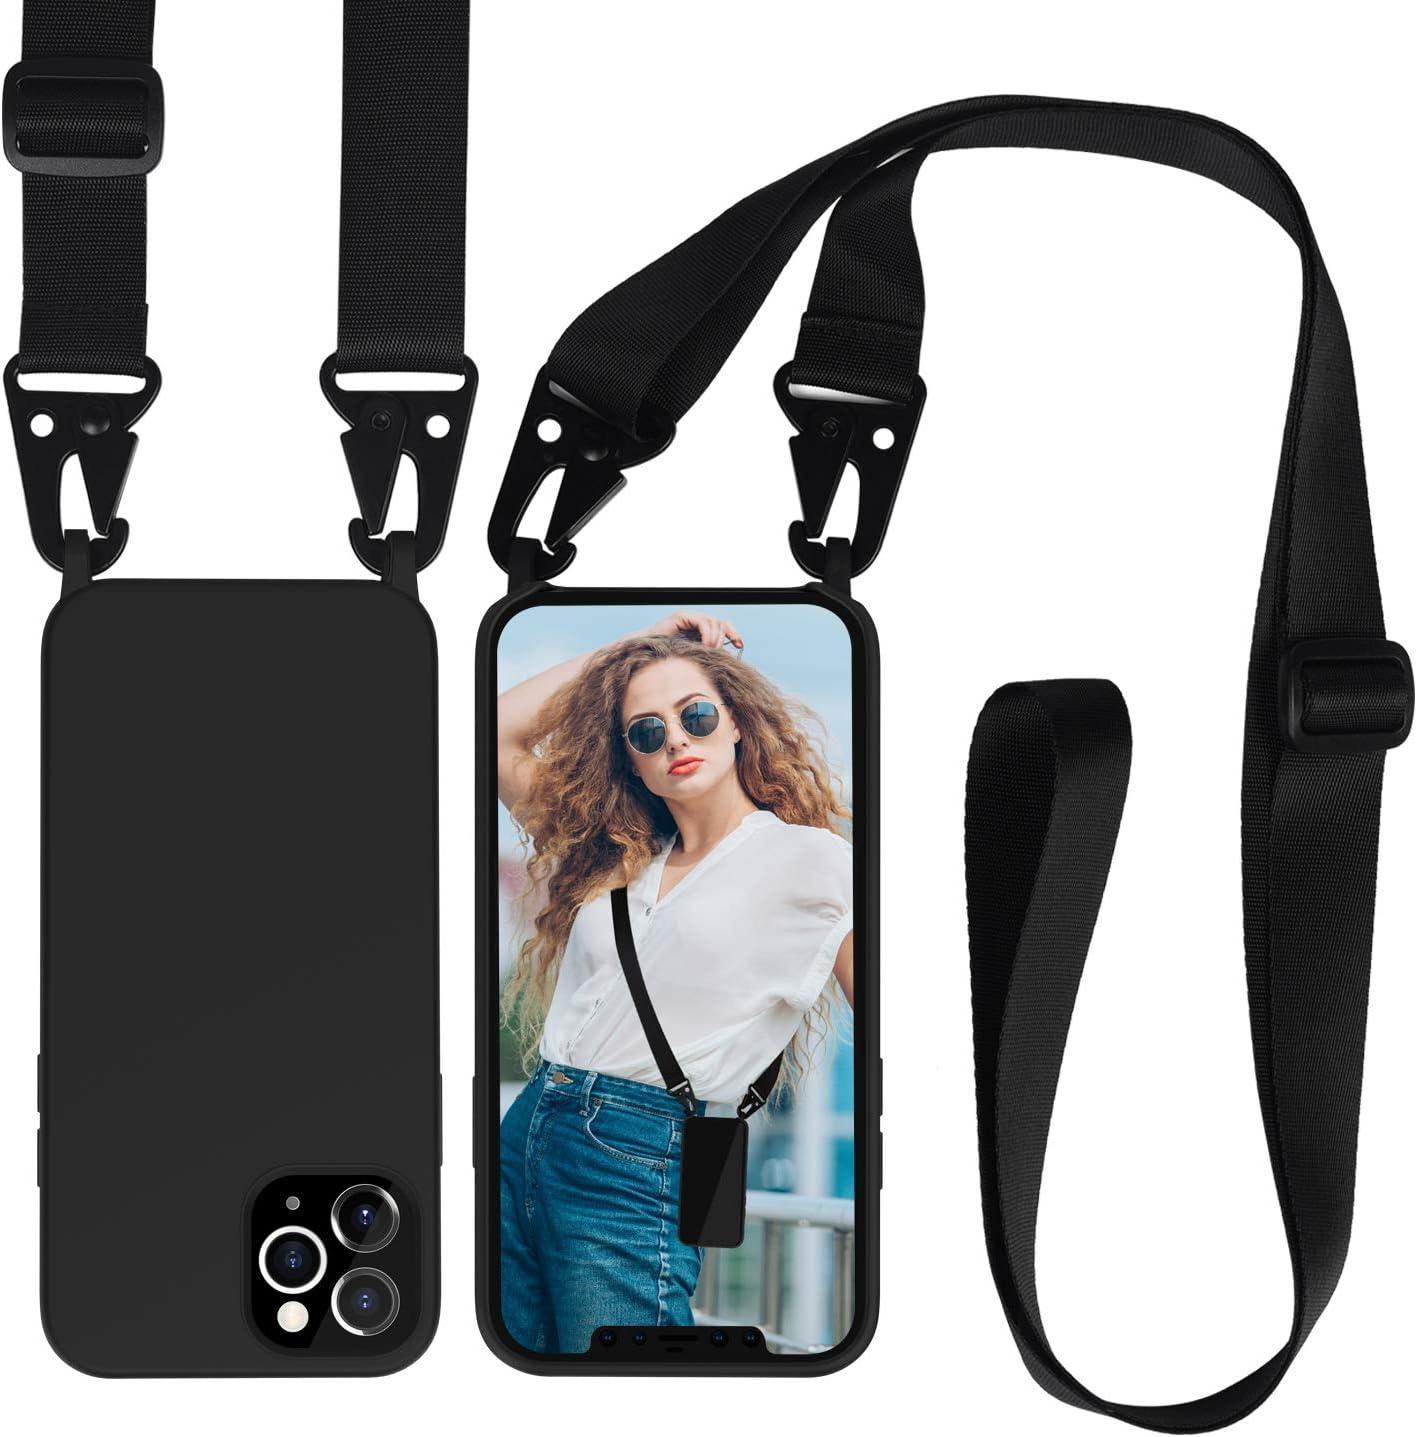 Allenett Iphone 12 Handyhüllen Mit Umhängeband Elektronik